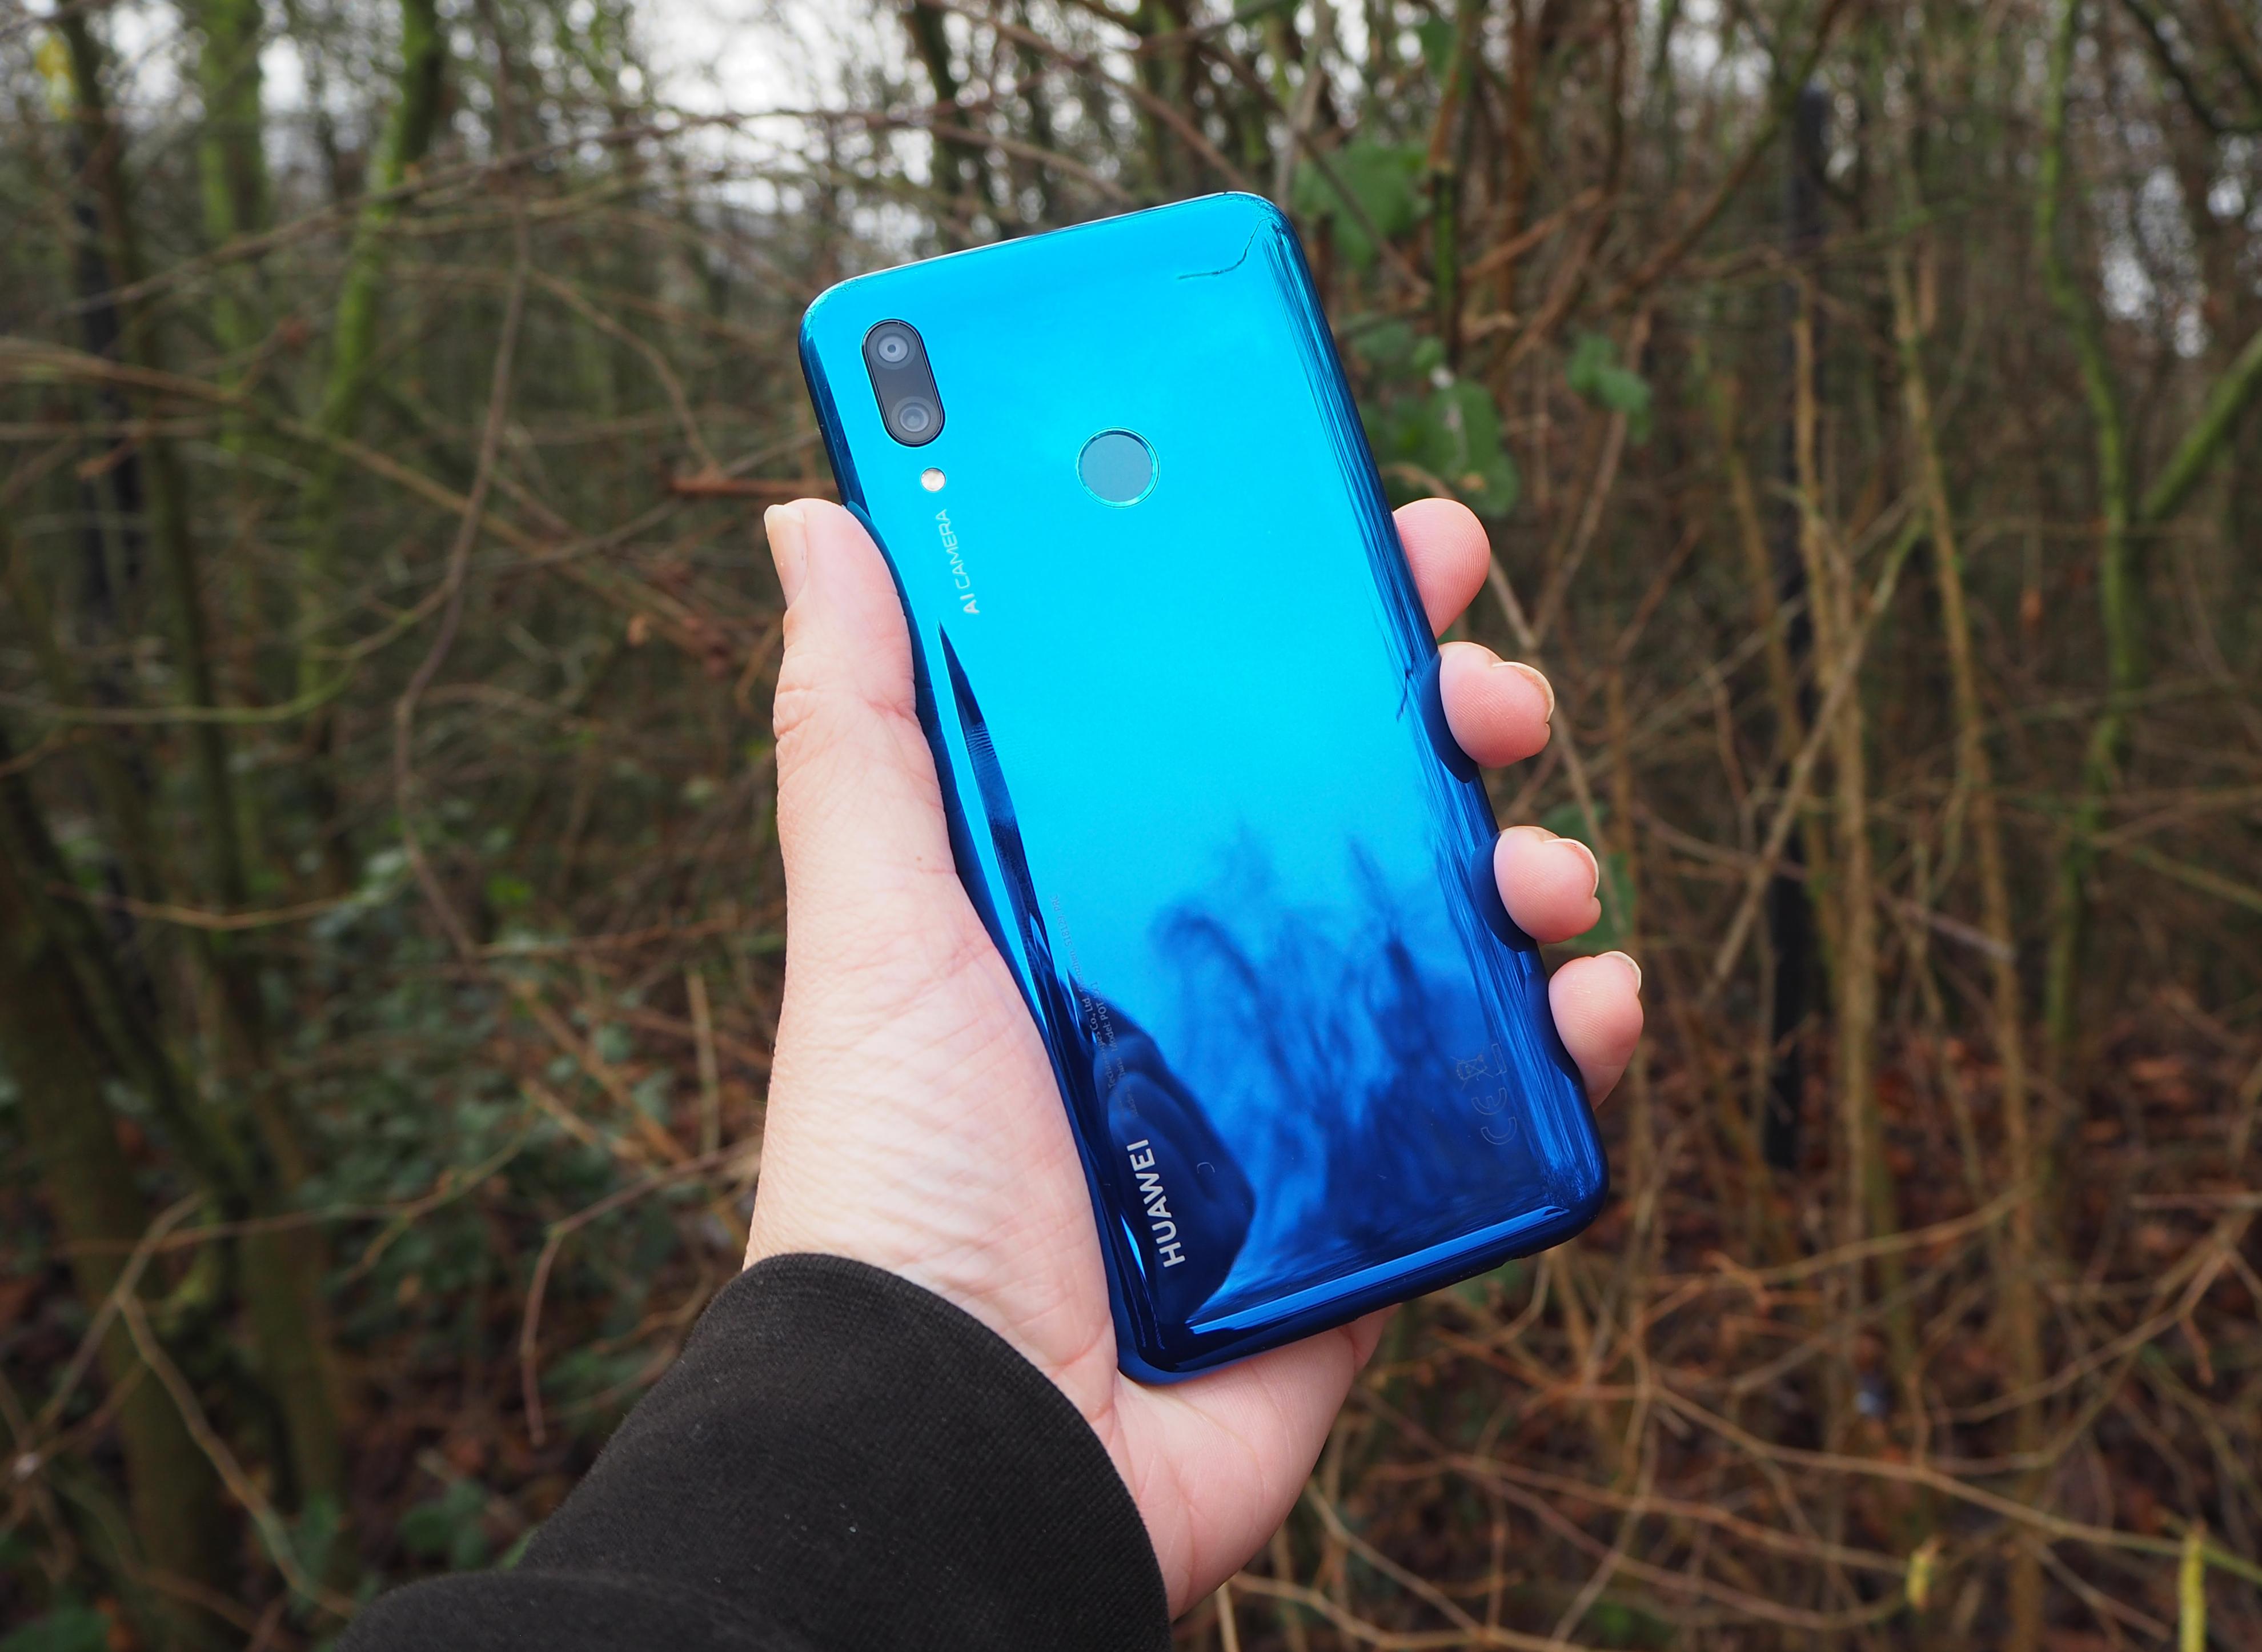 Huawei P Smart 2019 Budget Smartphone Sample Photos | ePHOTOzine